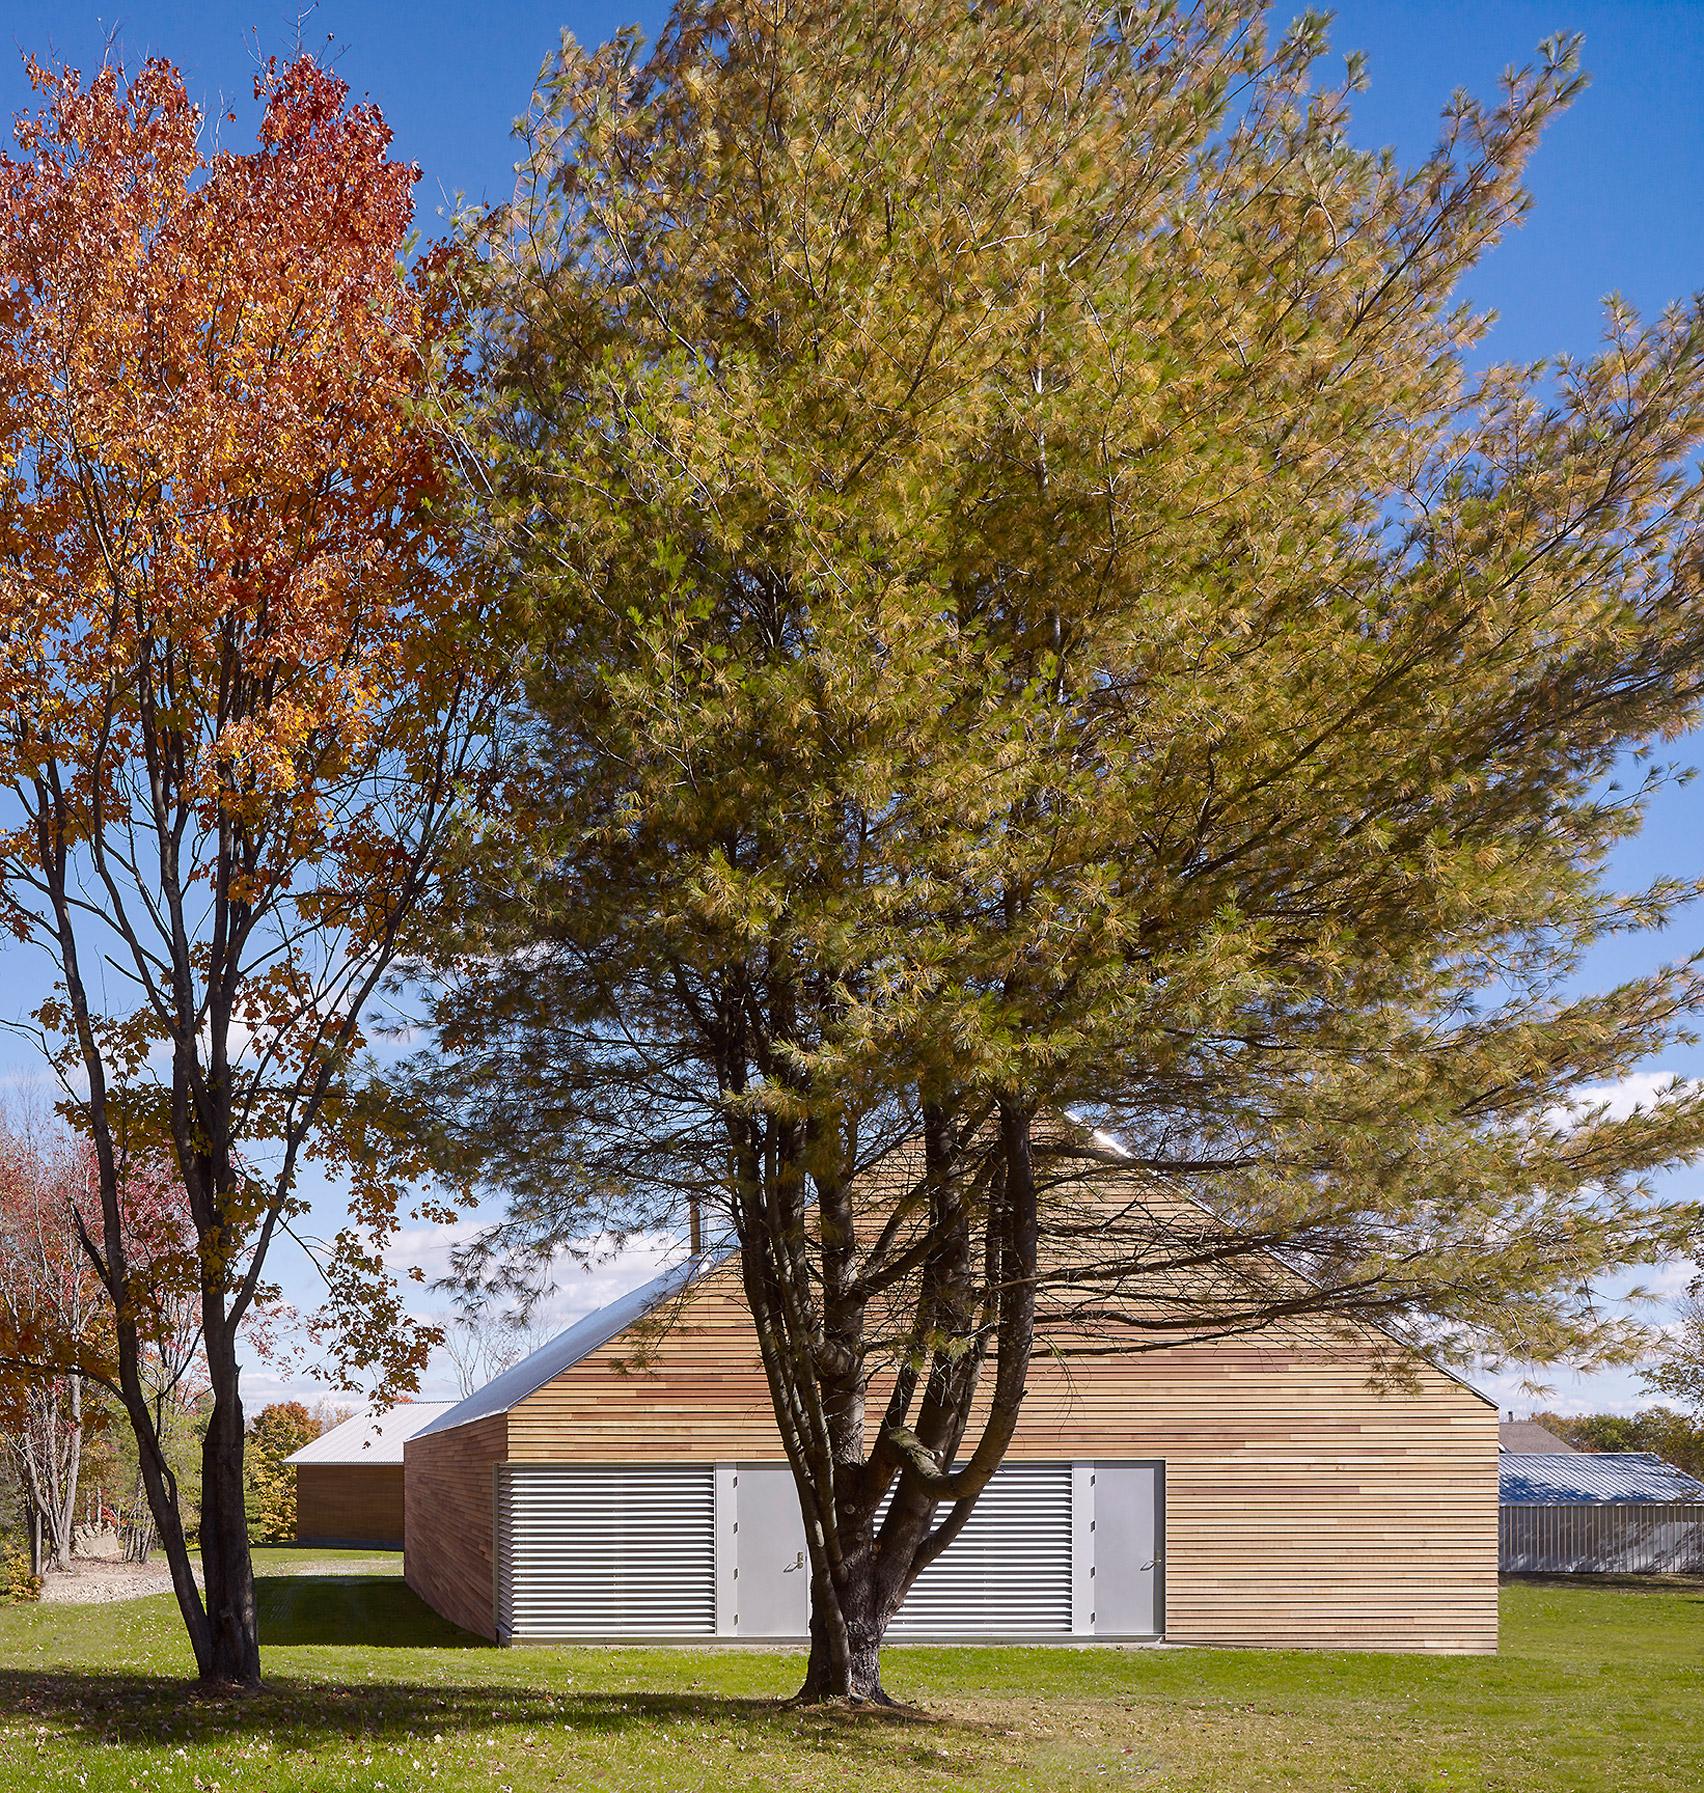 Buro Koray Duman adds barn-like gallery to artist's residence in Upstate New York